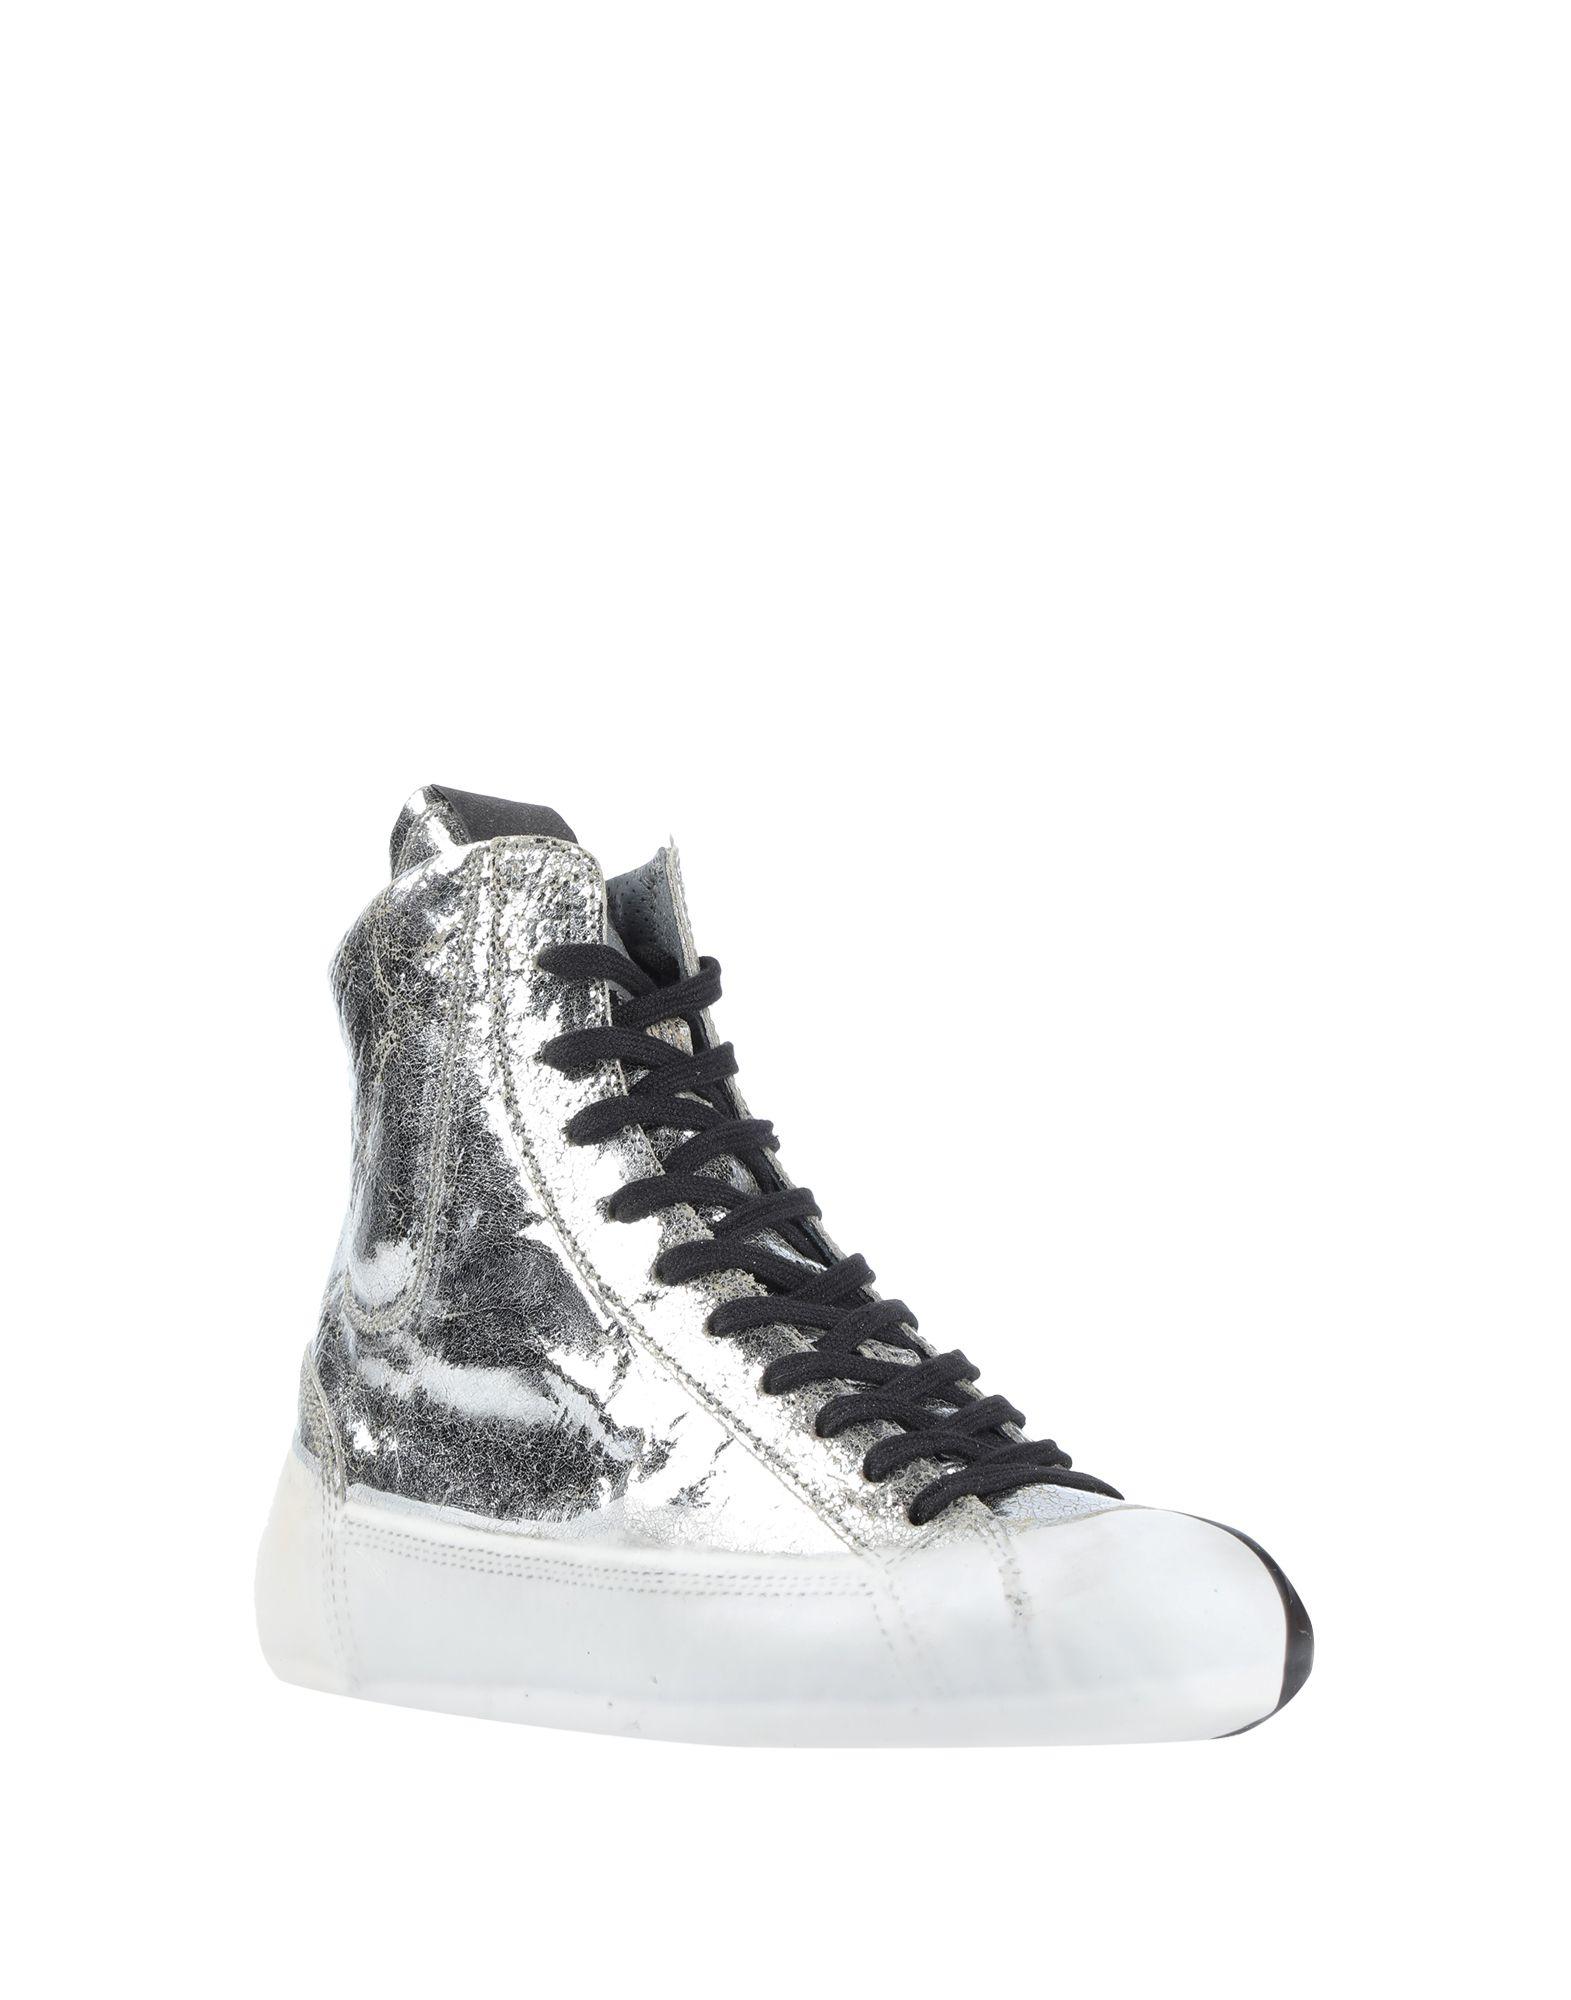 Rabatt Schuhe O.X.S. Rubber 11573461UA Soul Sneakers Damen  11573461UA Rubber a7a81c